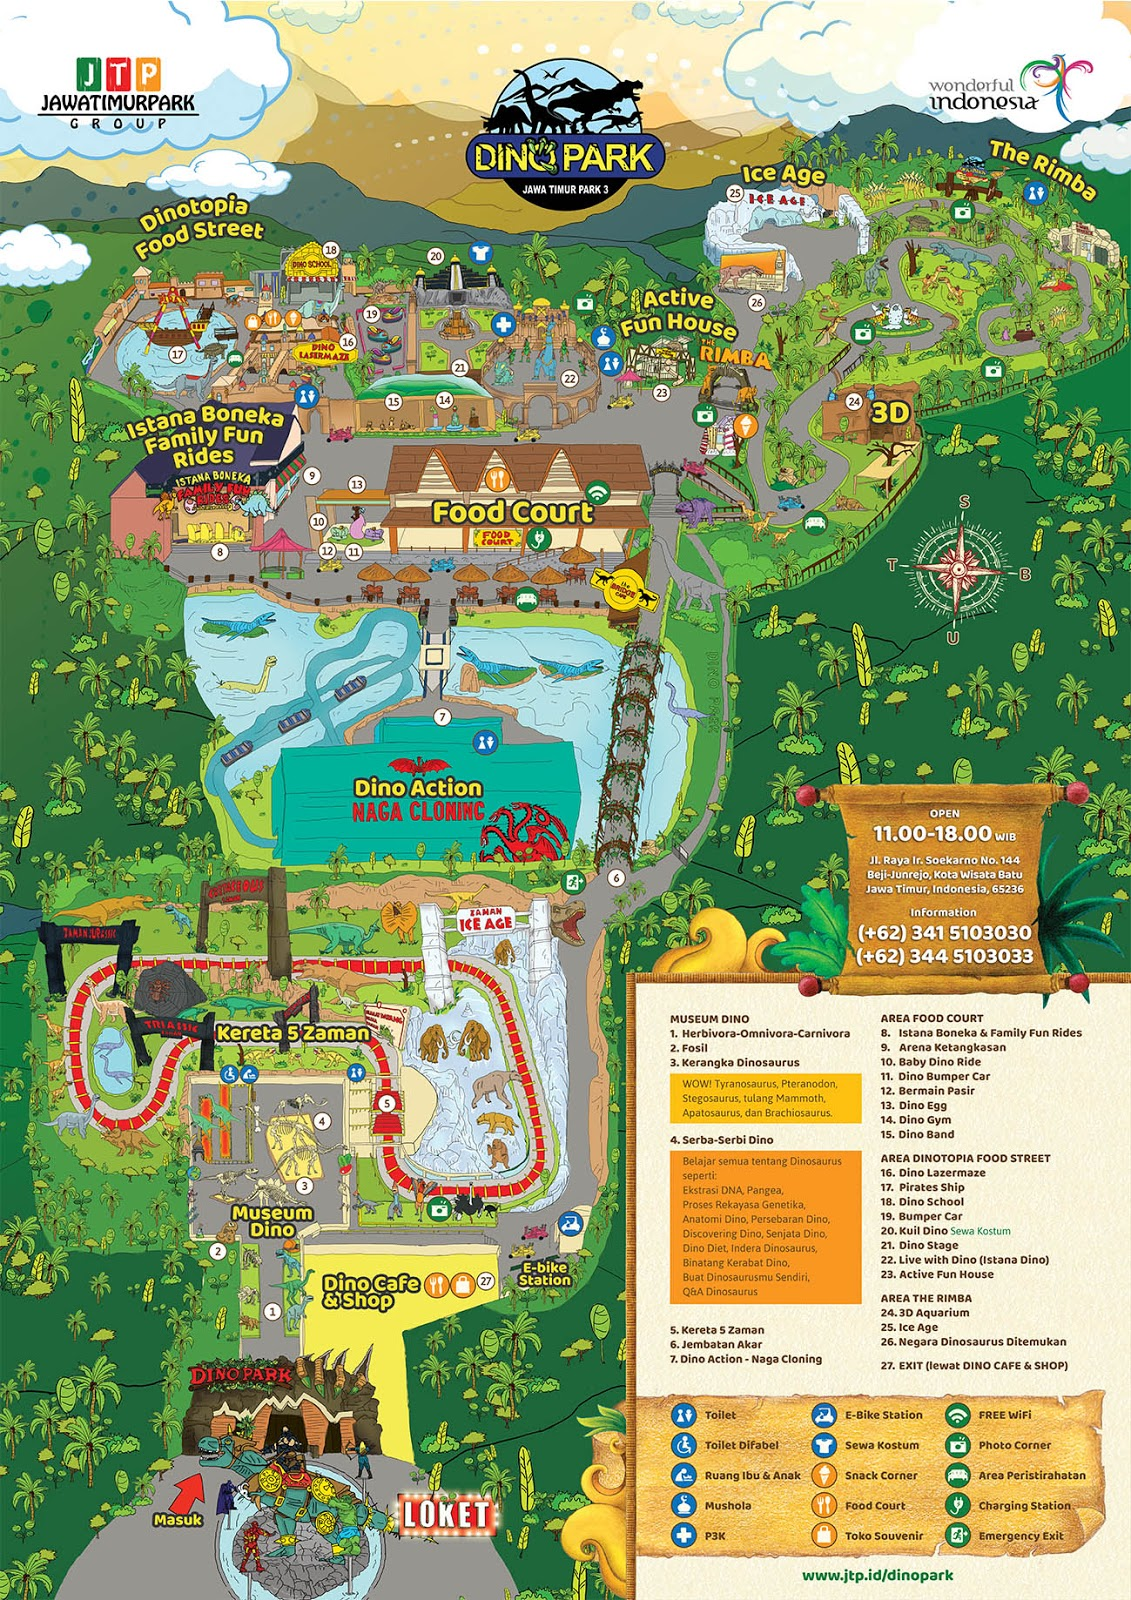 Harga Tiket Masuk Jatim Park 3 Terbaru S D Desember 2019 Titik Wisata